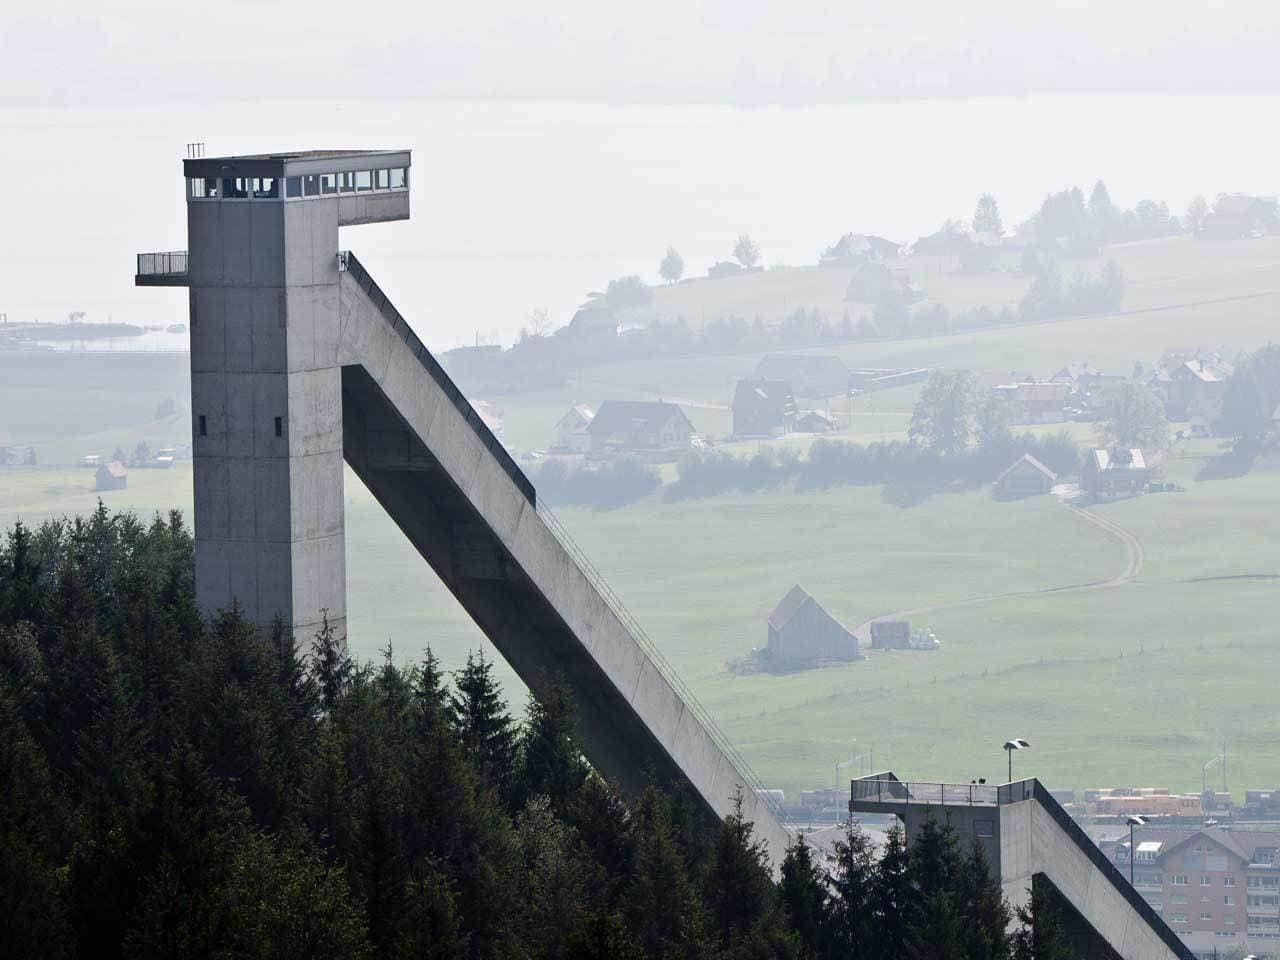 Ausflug: Schanzen-Brunch in spektakulärer Höhe – April bis September